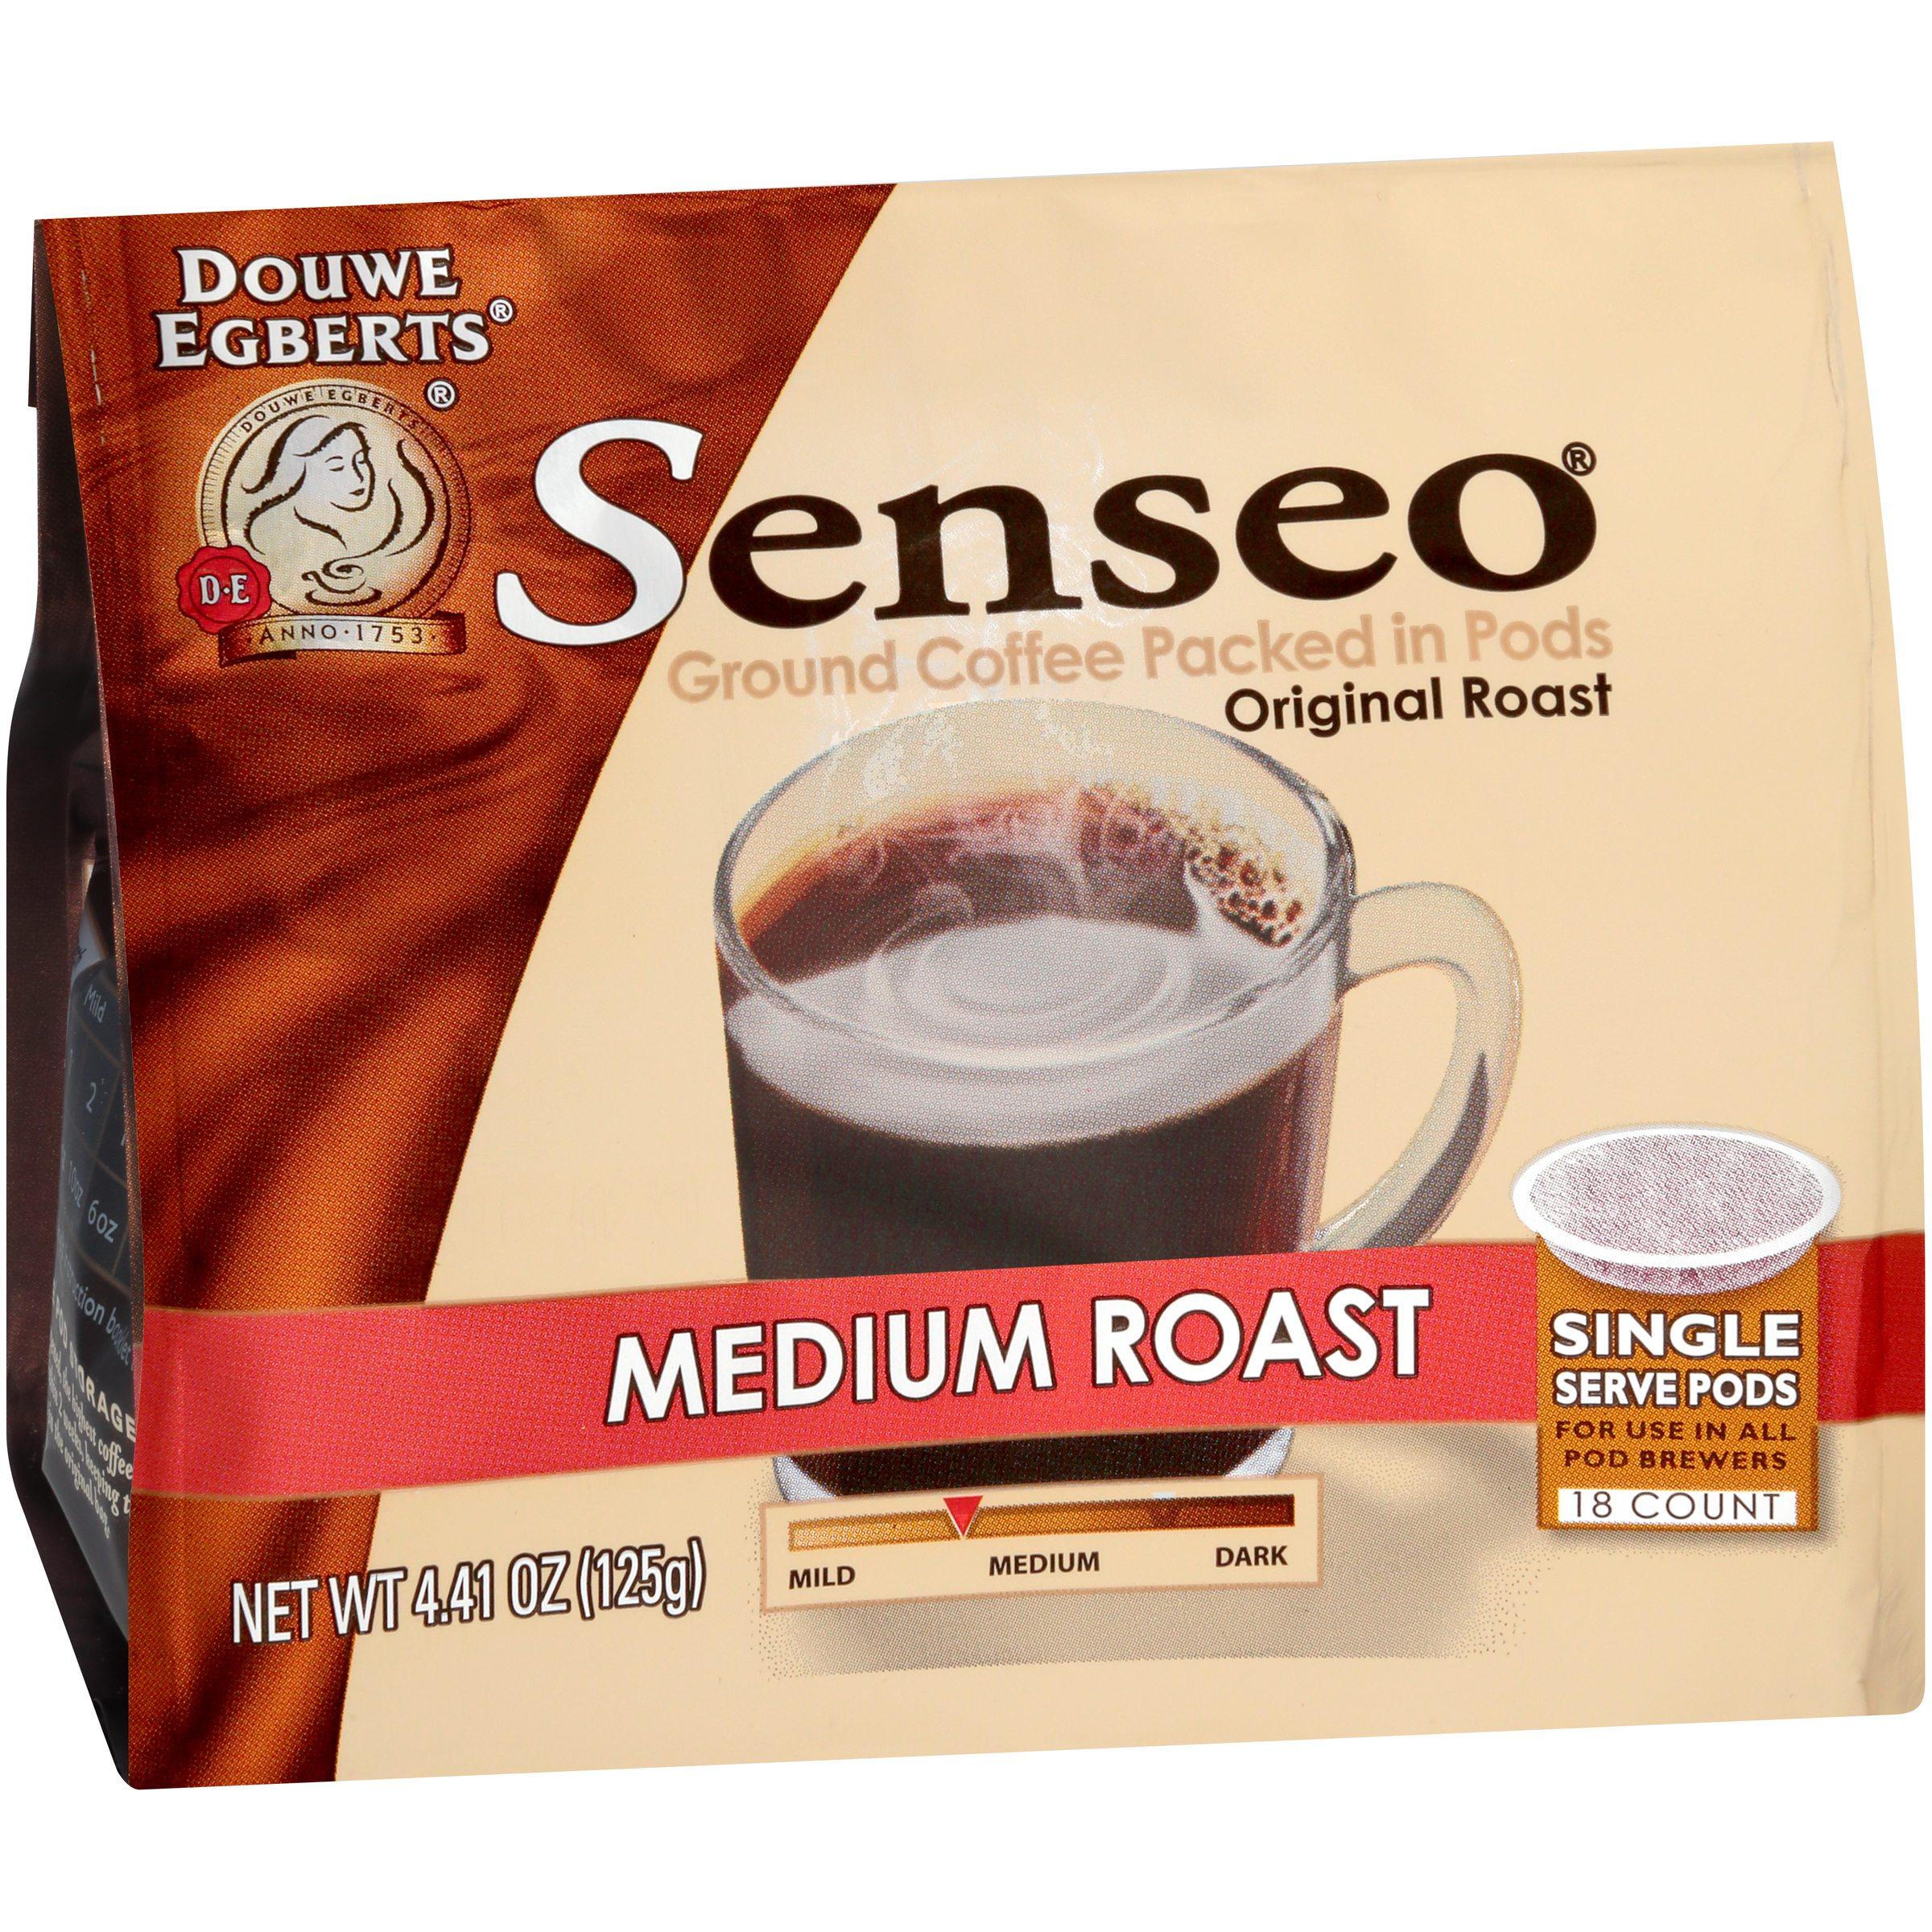 Senseo® Medium Roast Original Roast Ground Coffee Single Serve Pods 18 ct Bag